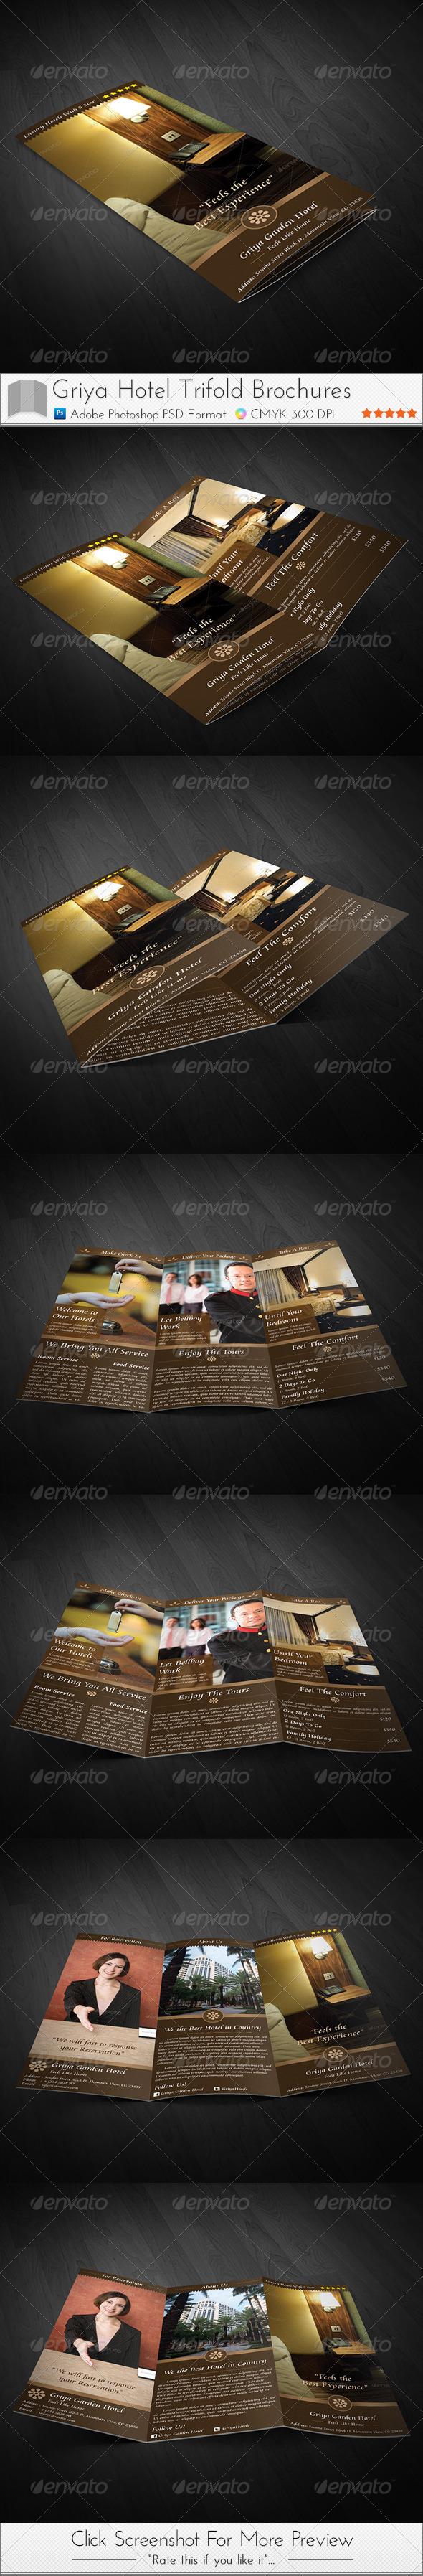 GraphicRiver Griya Hotel Trifold Brochure 3805931